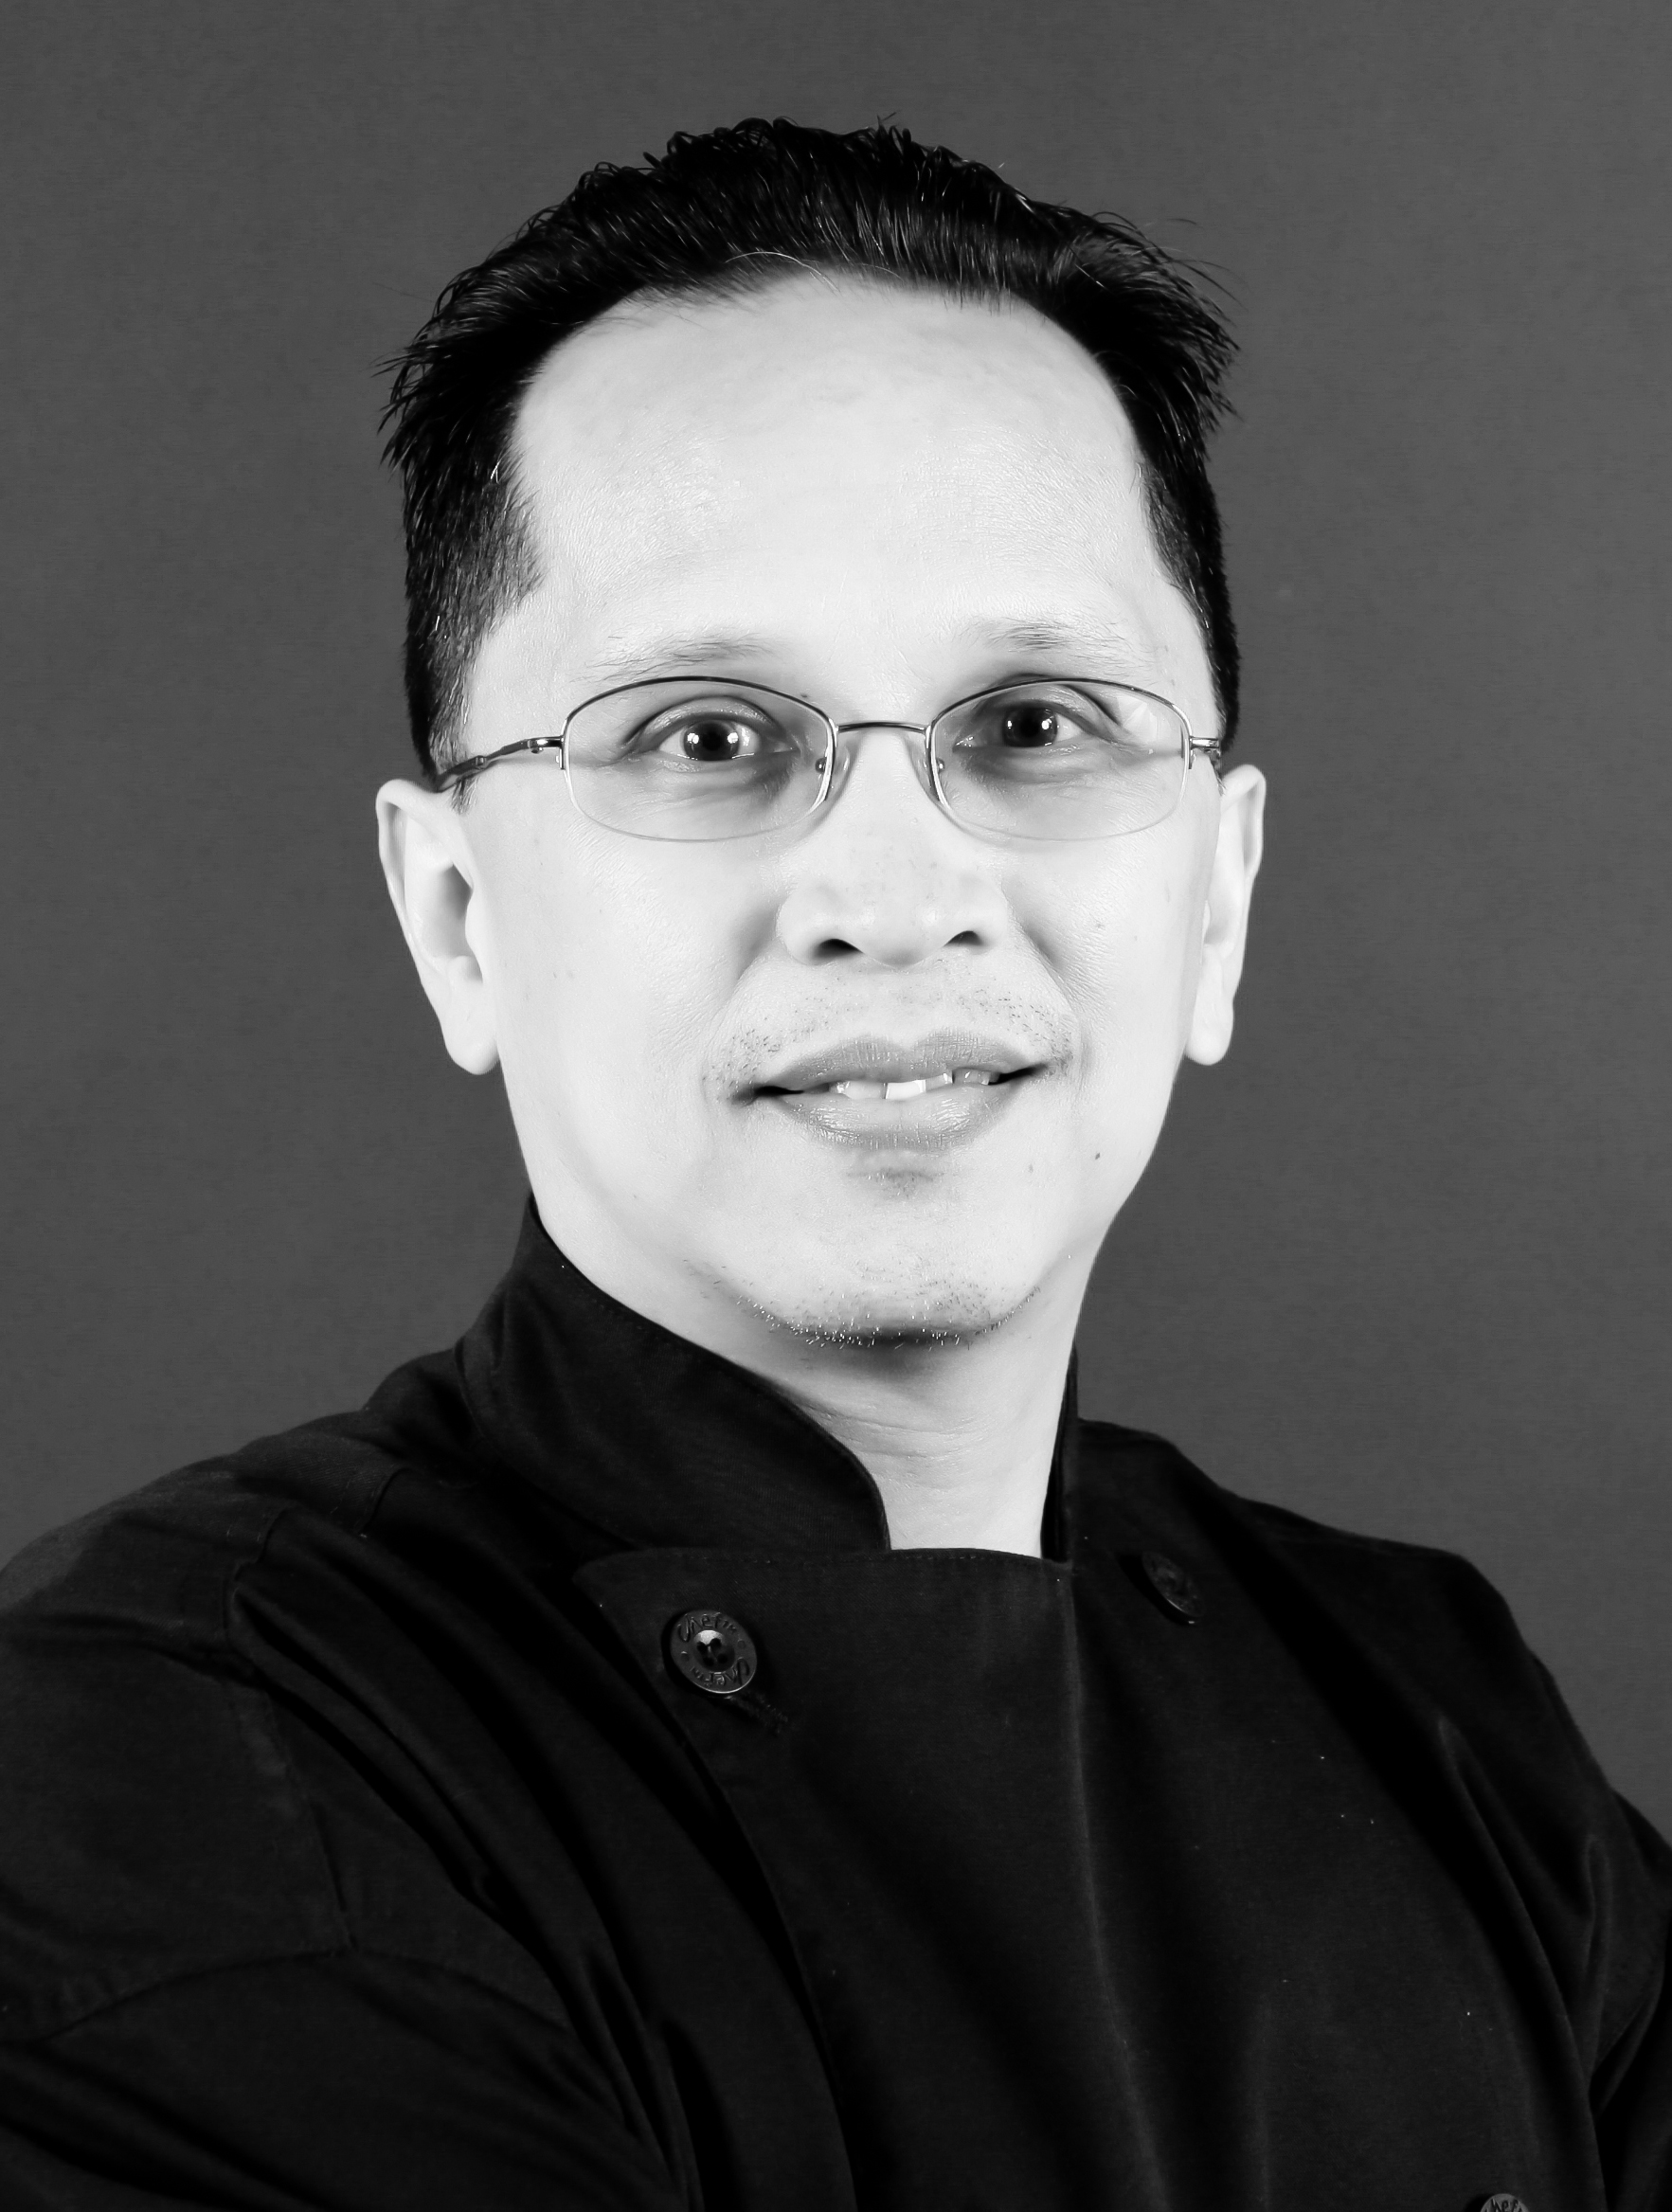 Chef Ferron Lining